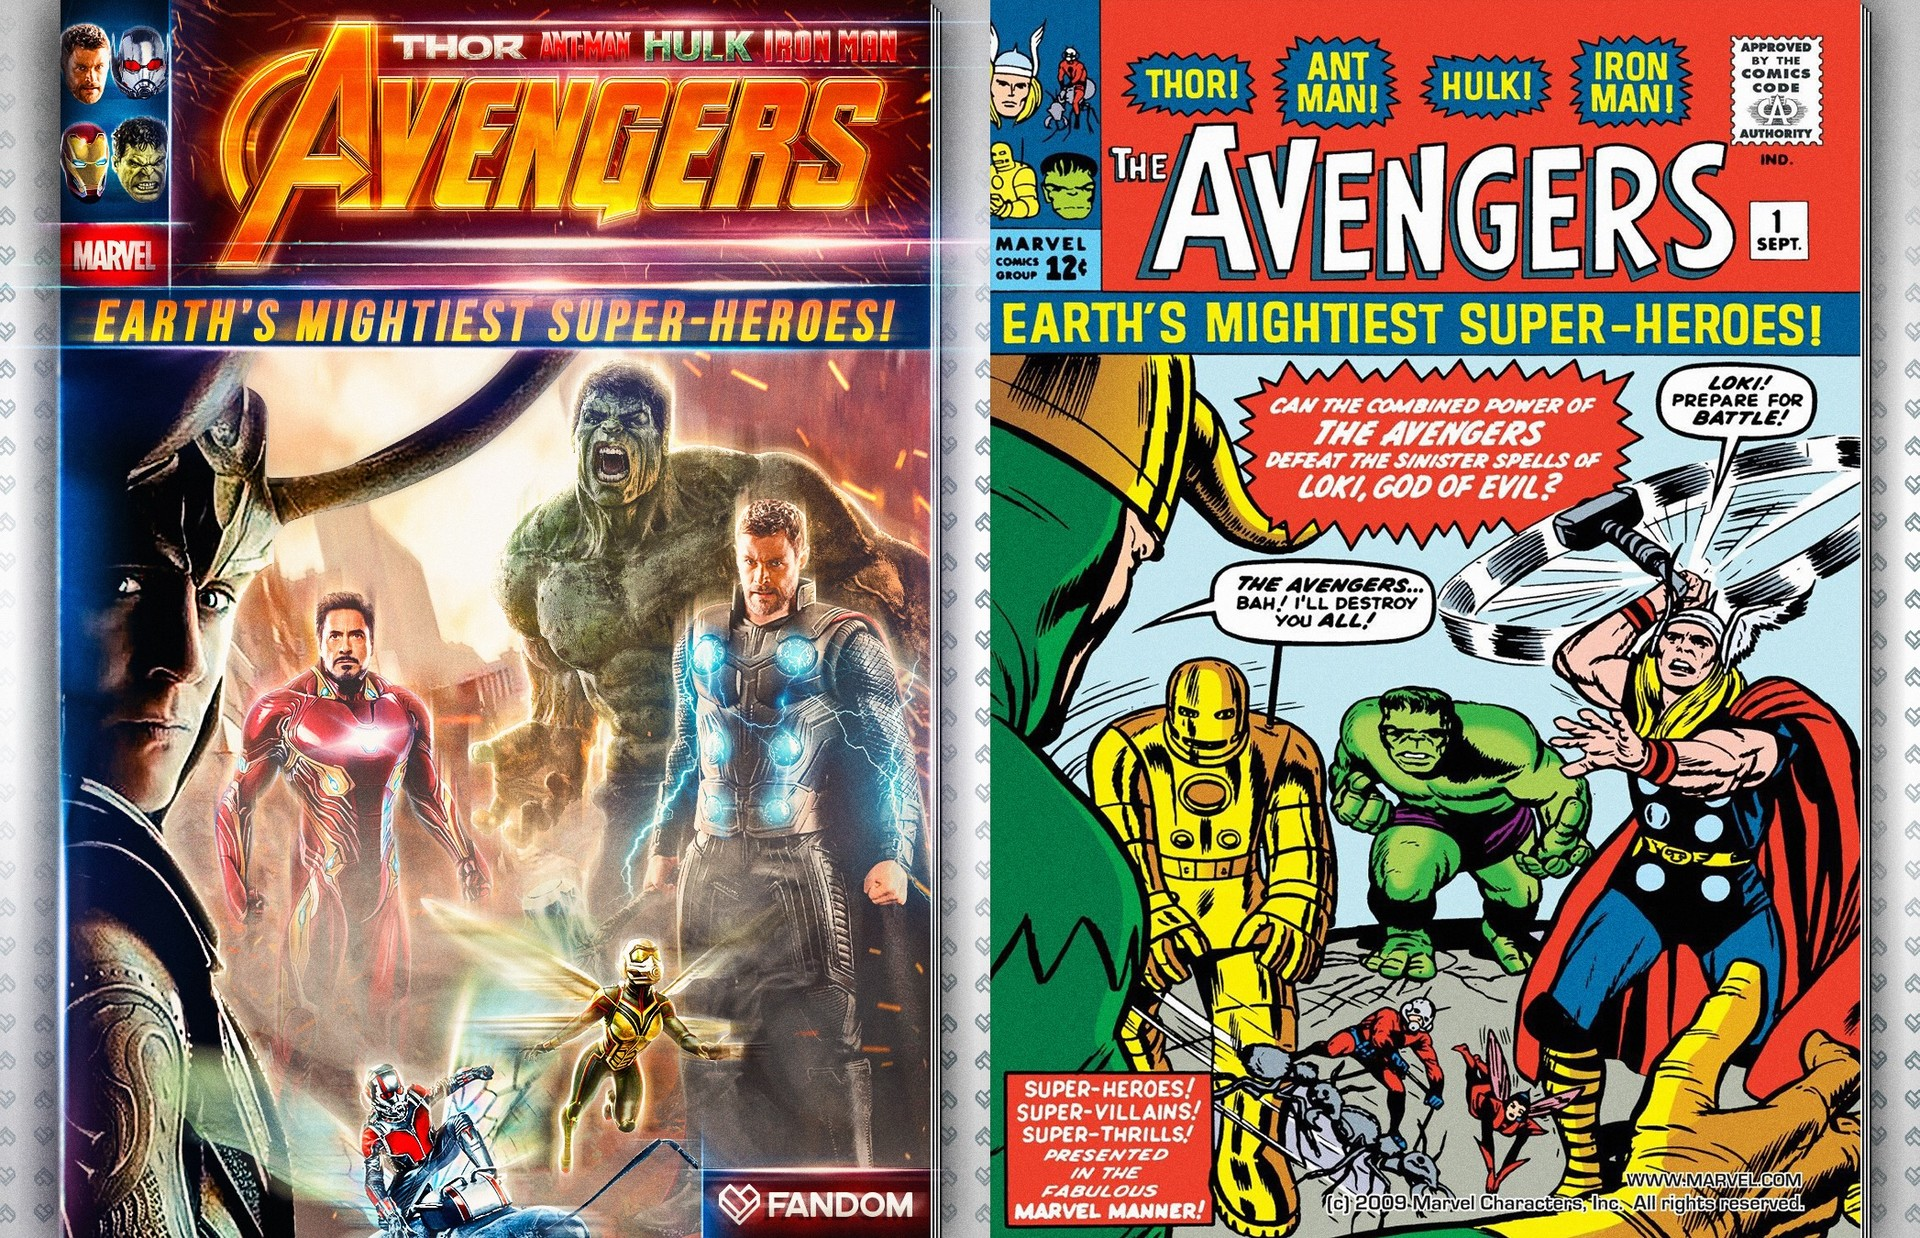 Nick tam compare avengers1